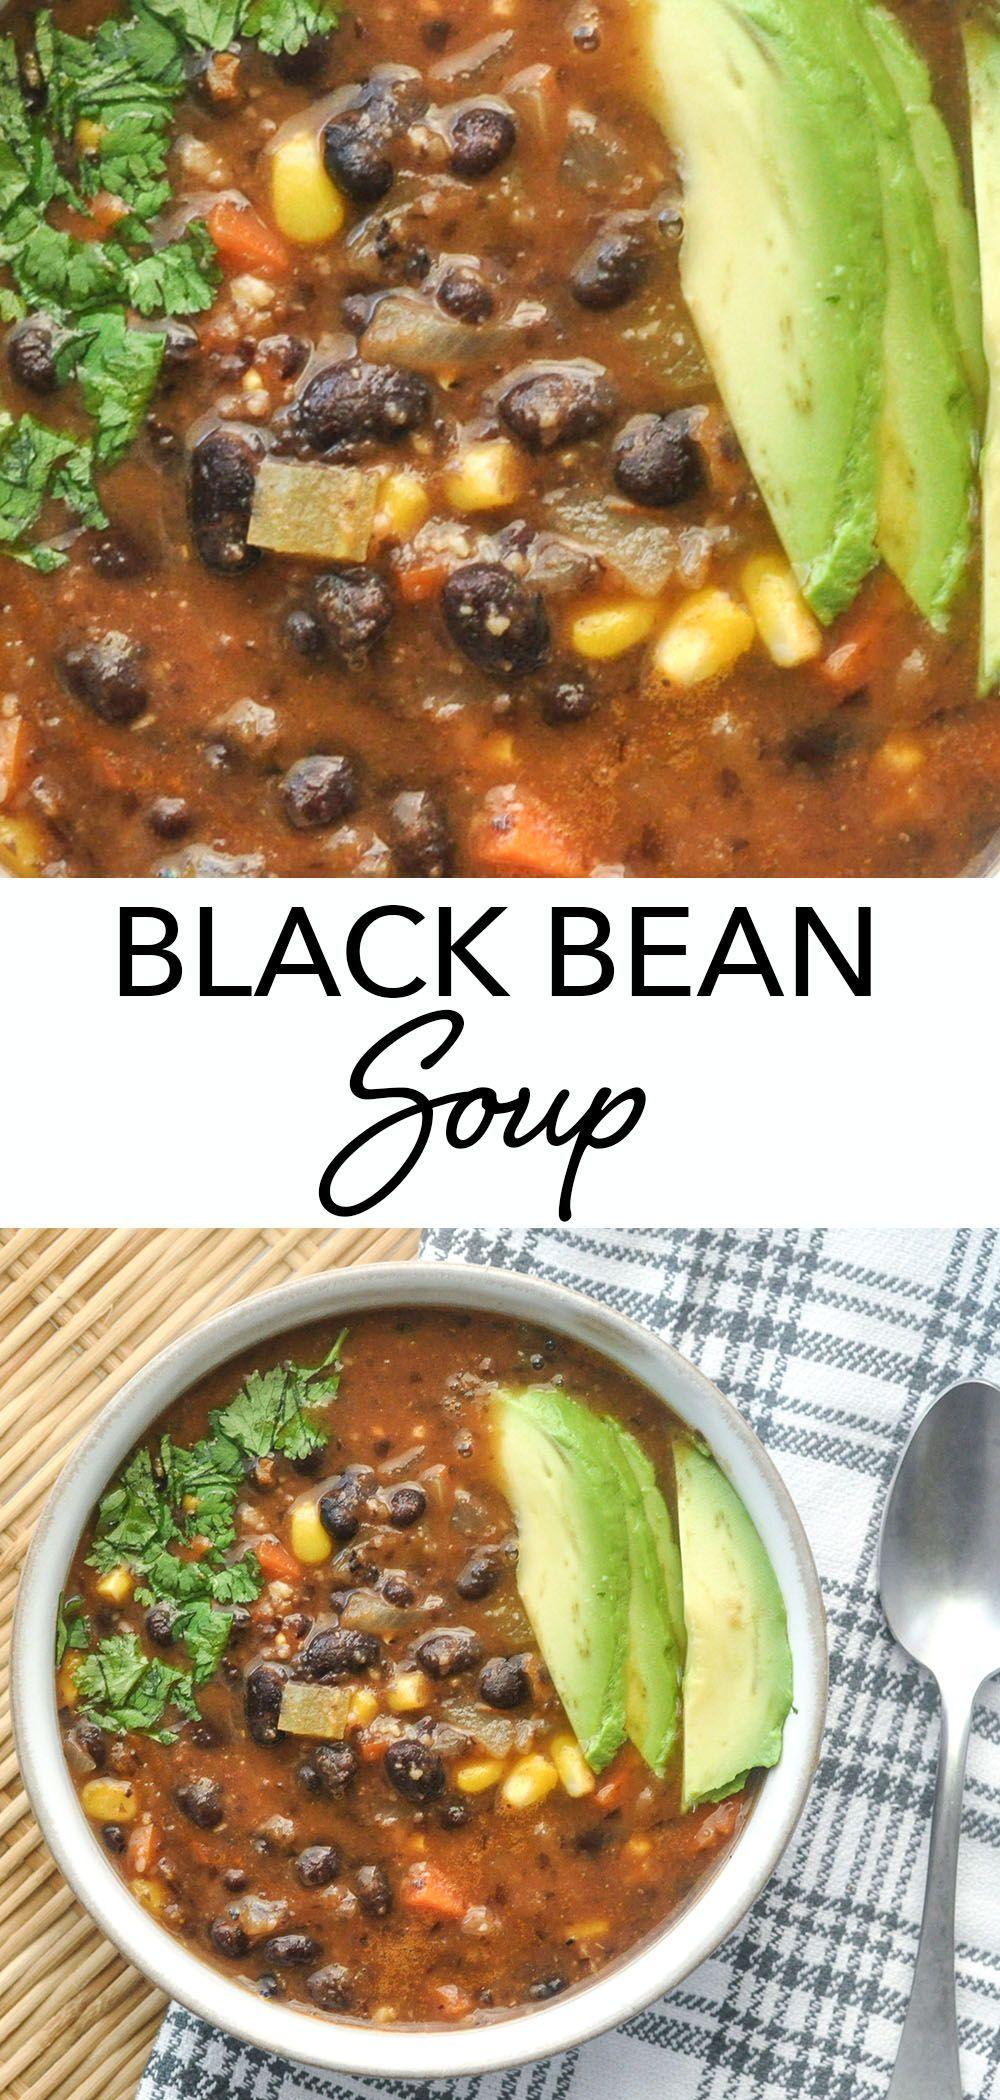 Black Bean Soup | Veggiecurean - Celebrating Plants